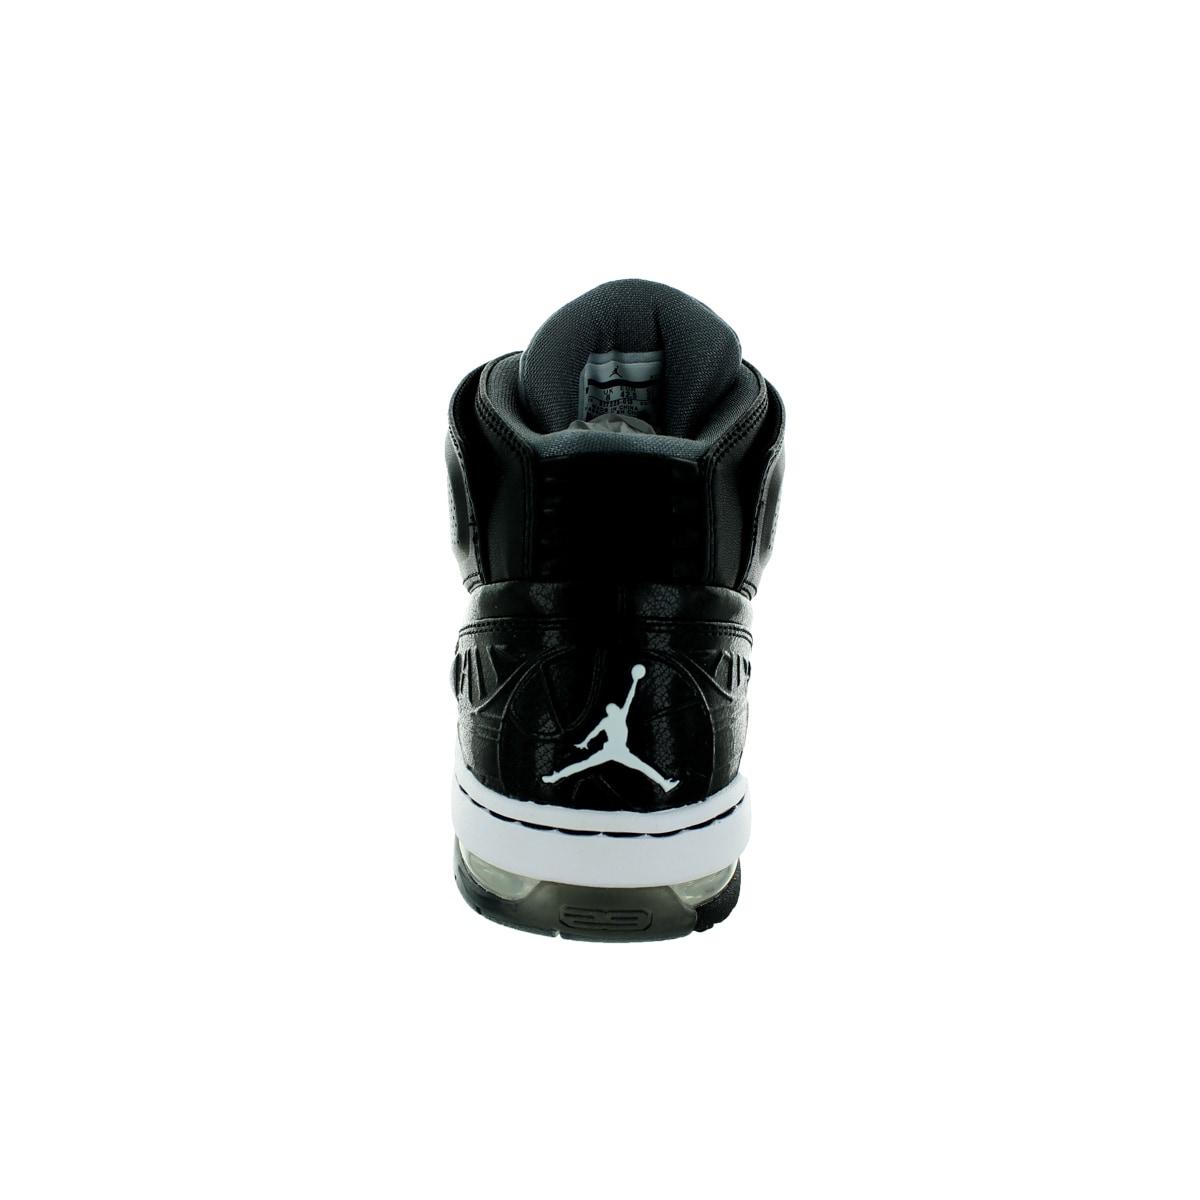 45499c92861 Shop Nike Jordan Men's Jordan Ol'School Black/White/Cool Grey Basketball  Shoe - Free Shipping Today - Overstock - 12318839